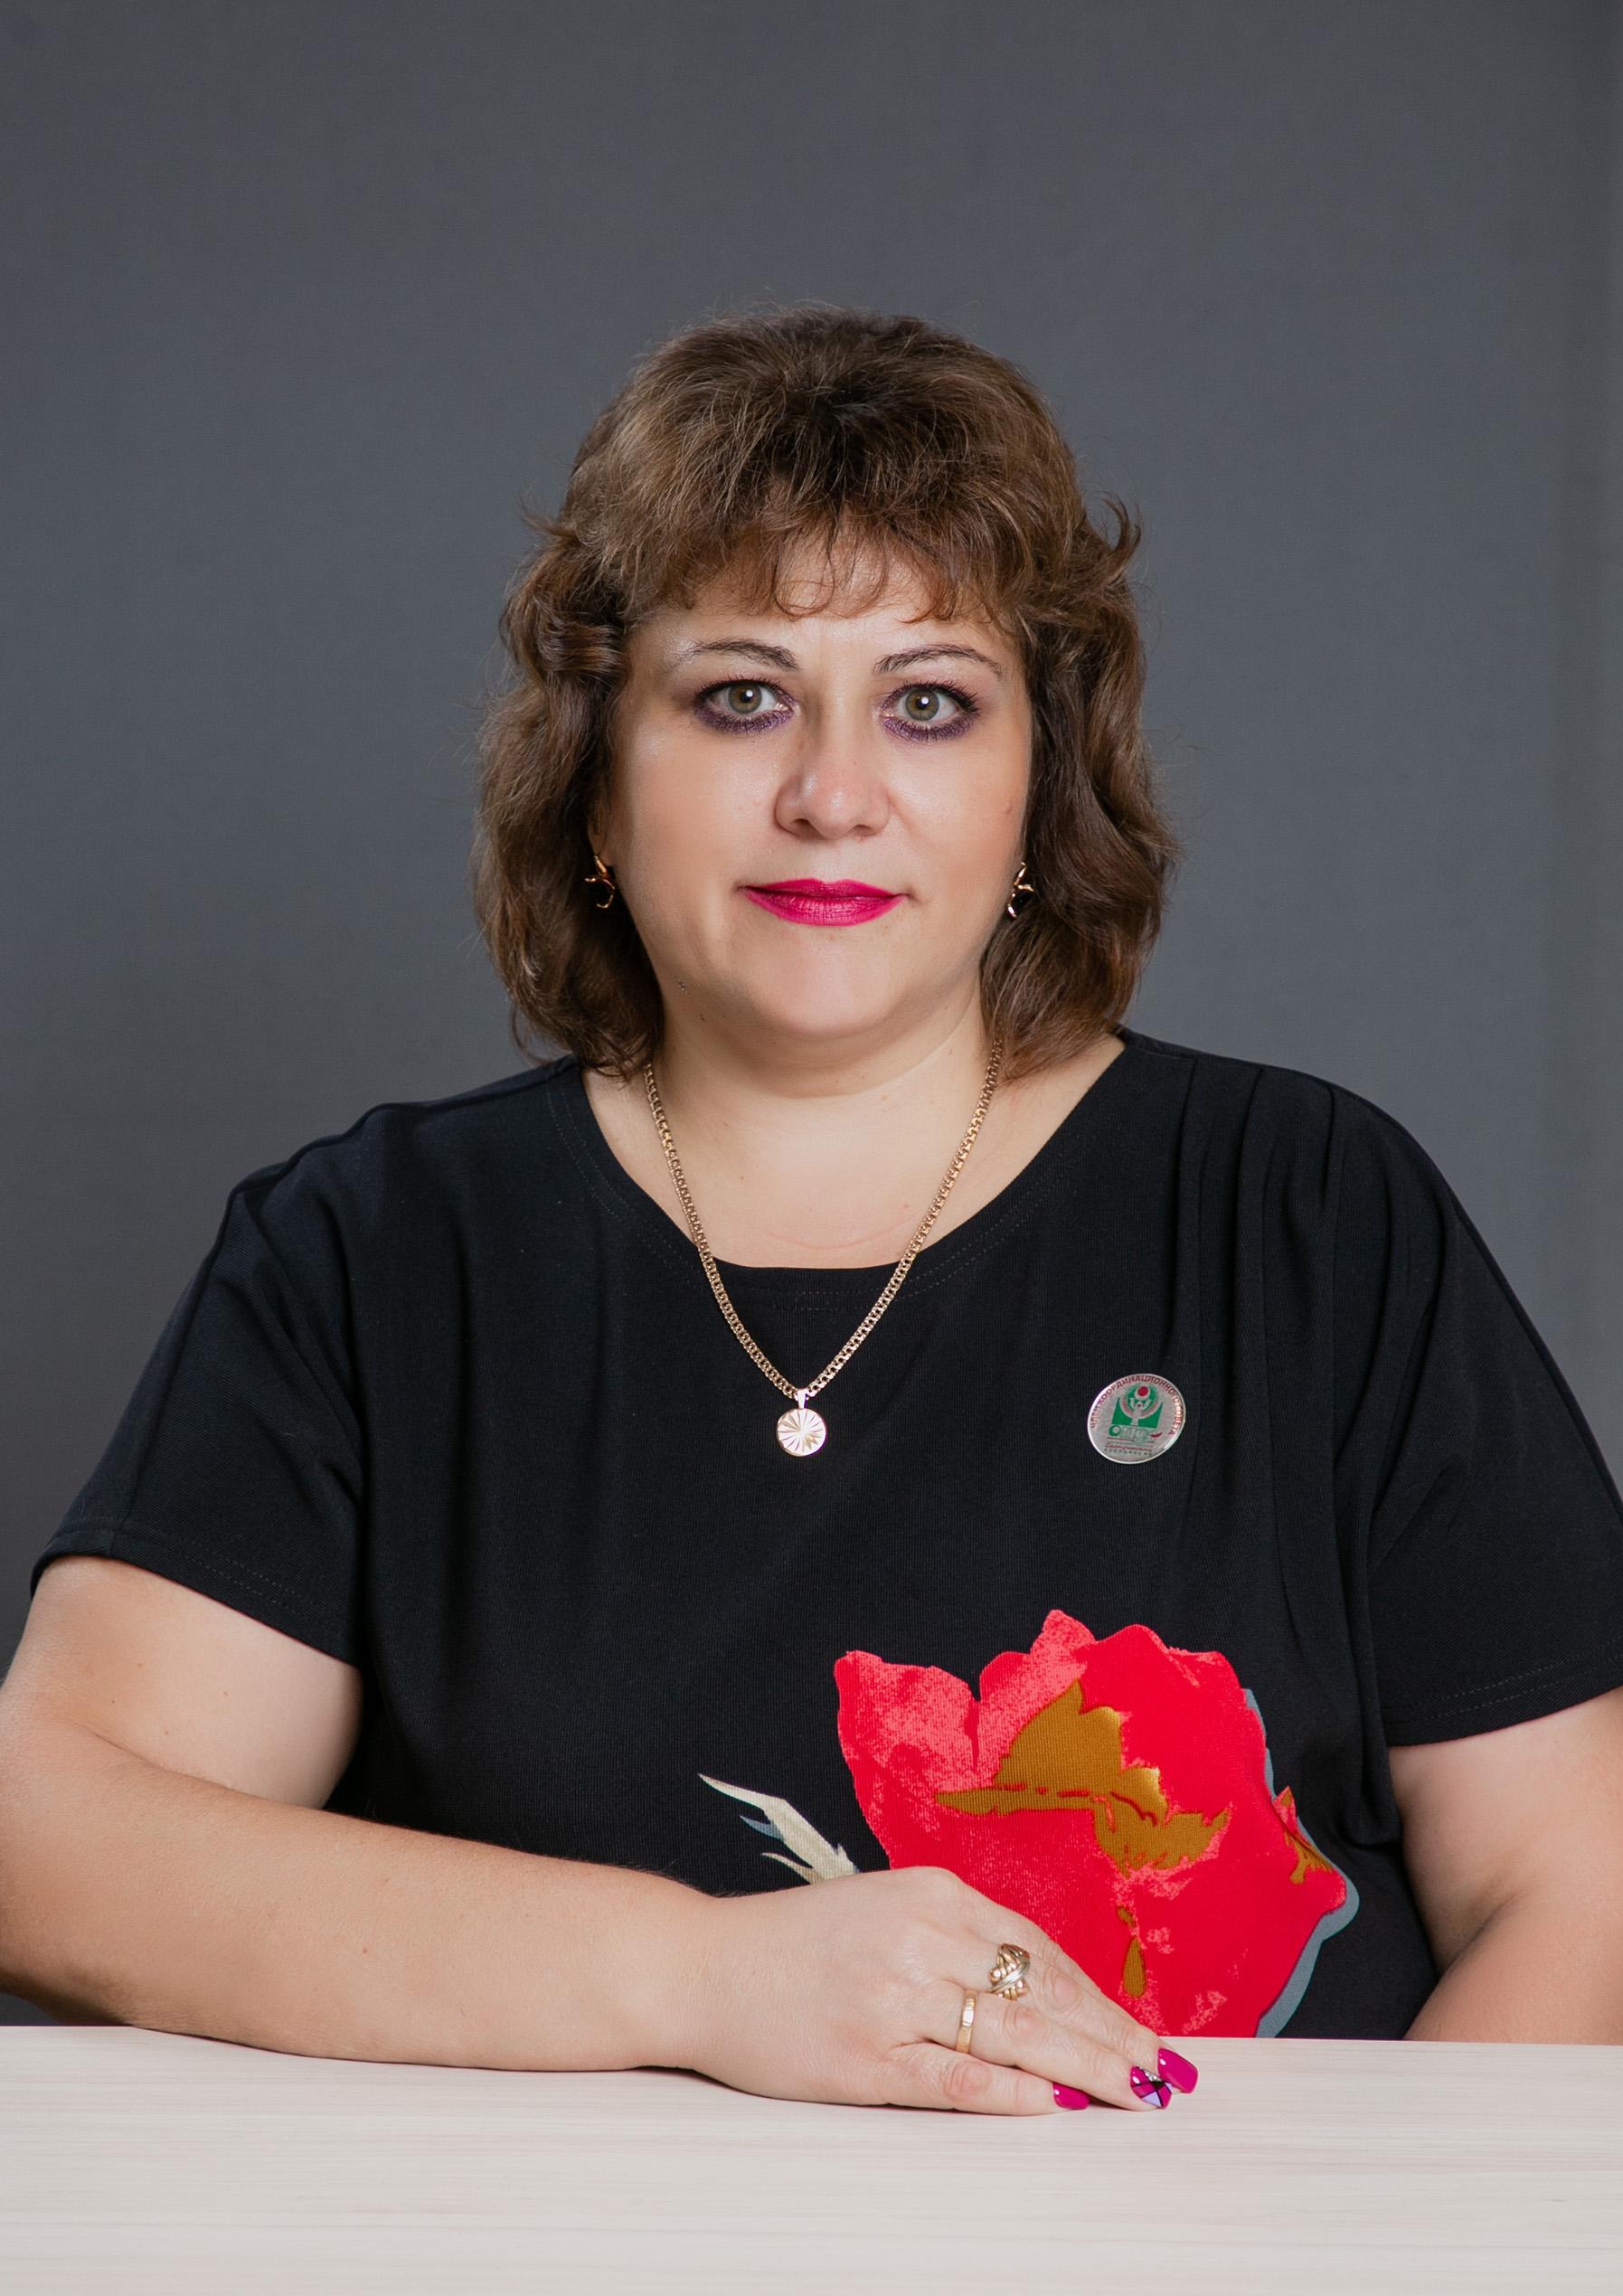 Дорошенко Марина Юрьевна